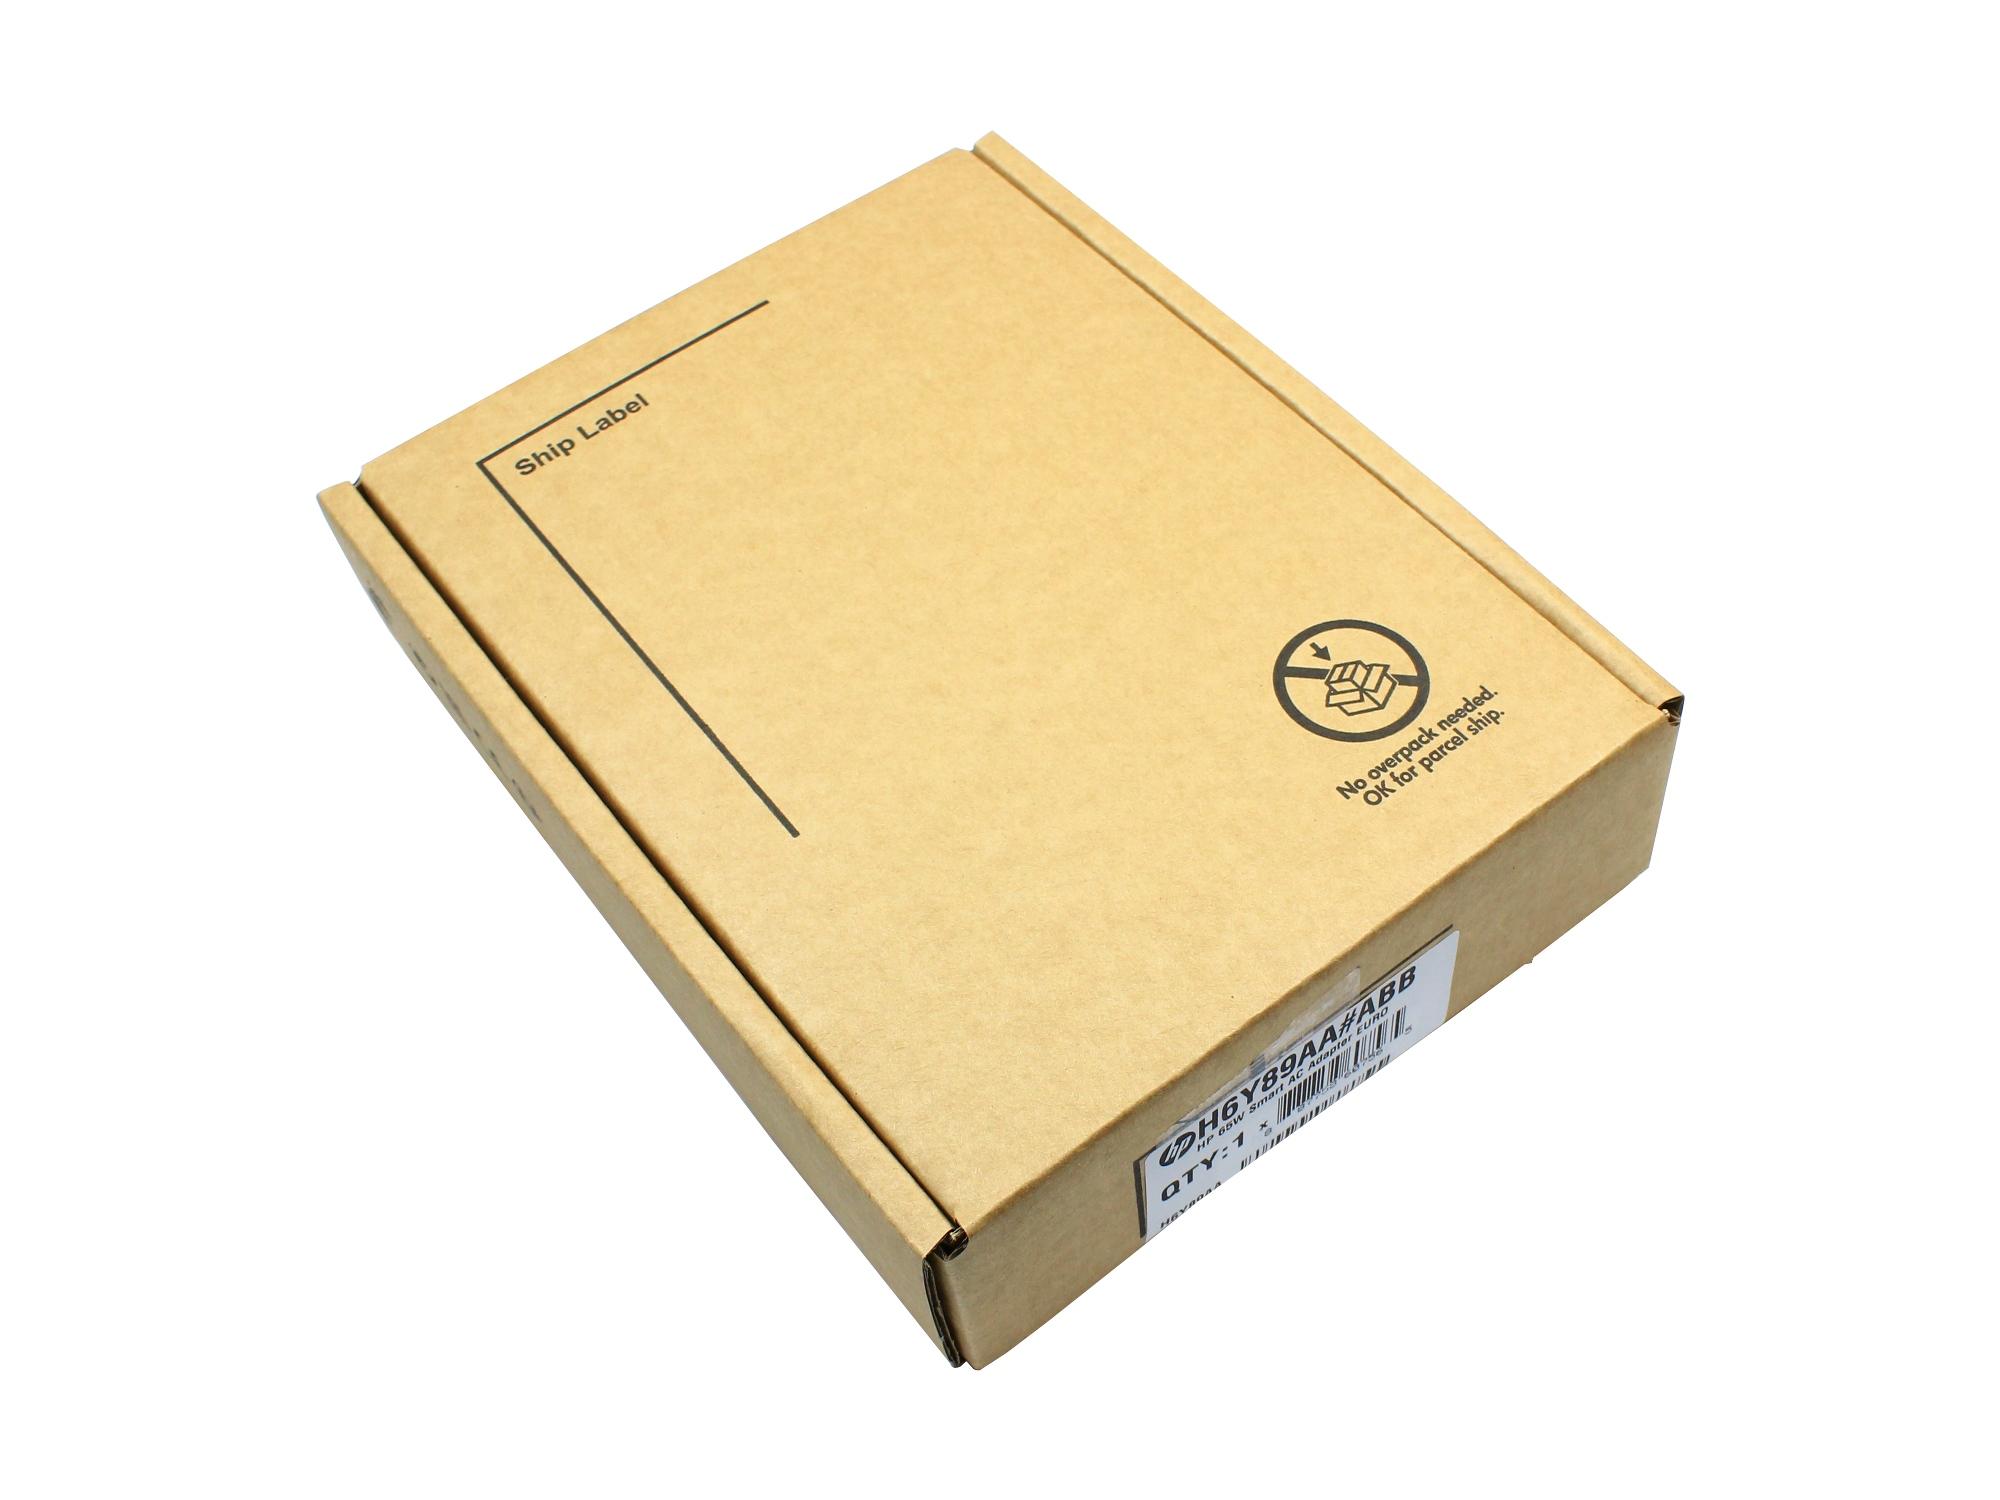 Incarcator original HP EliteBook 850 G6, 65W 4.5mm pin